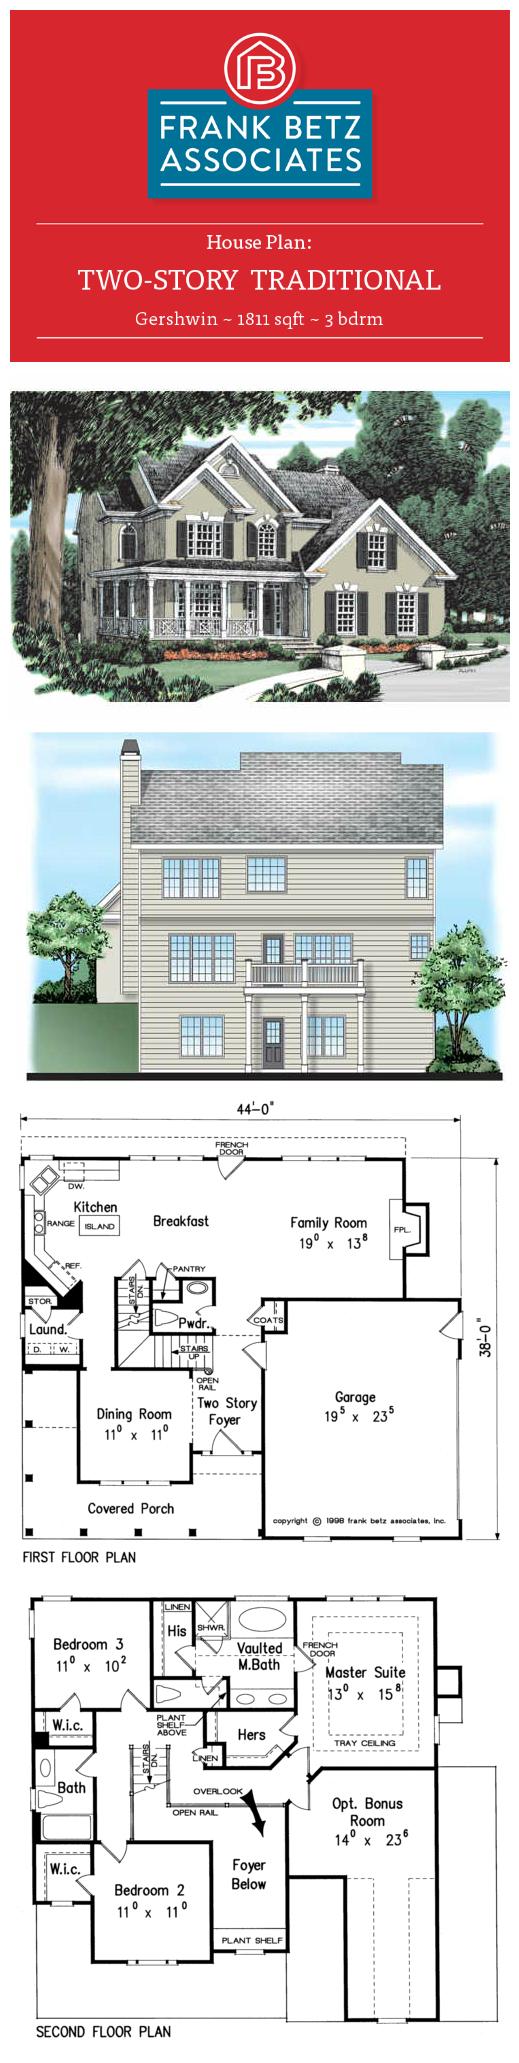 Gershwin: 1811 sqft, 3 bdrm traditional house plan design by Frank Betz Associates inc.  #houseplan